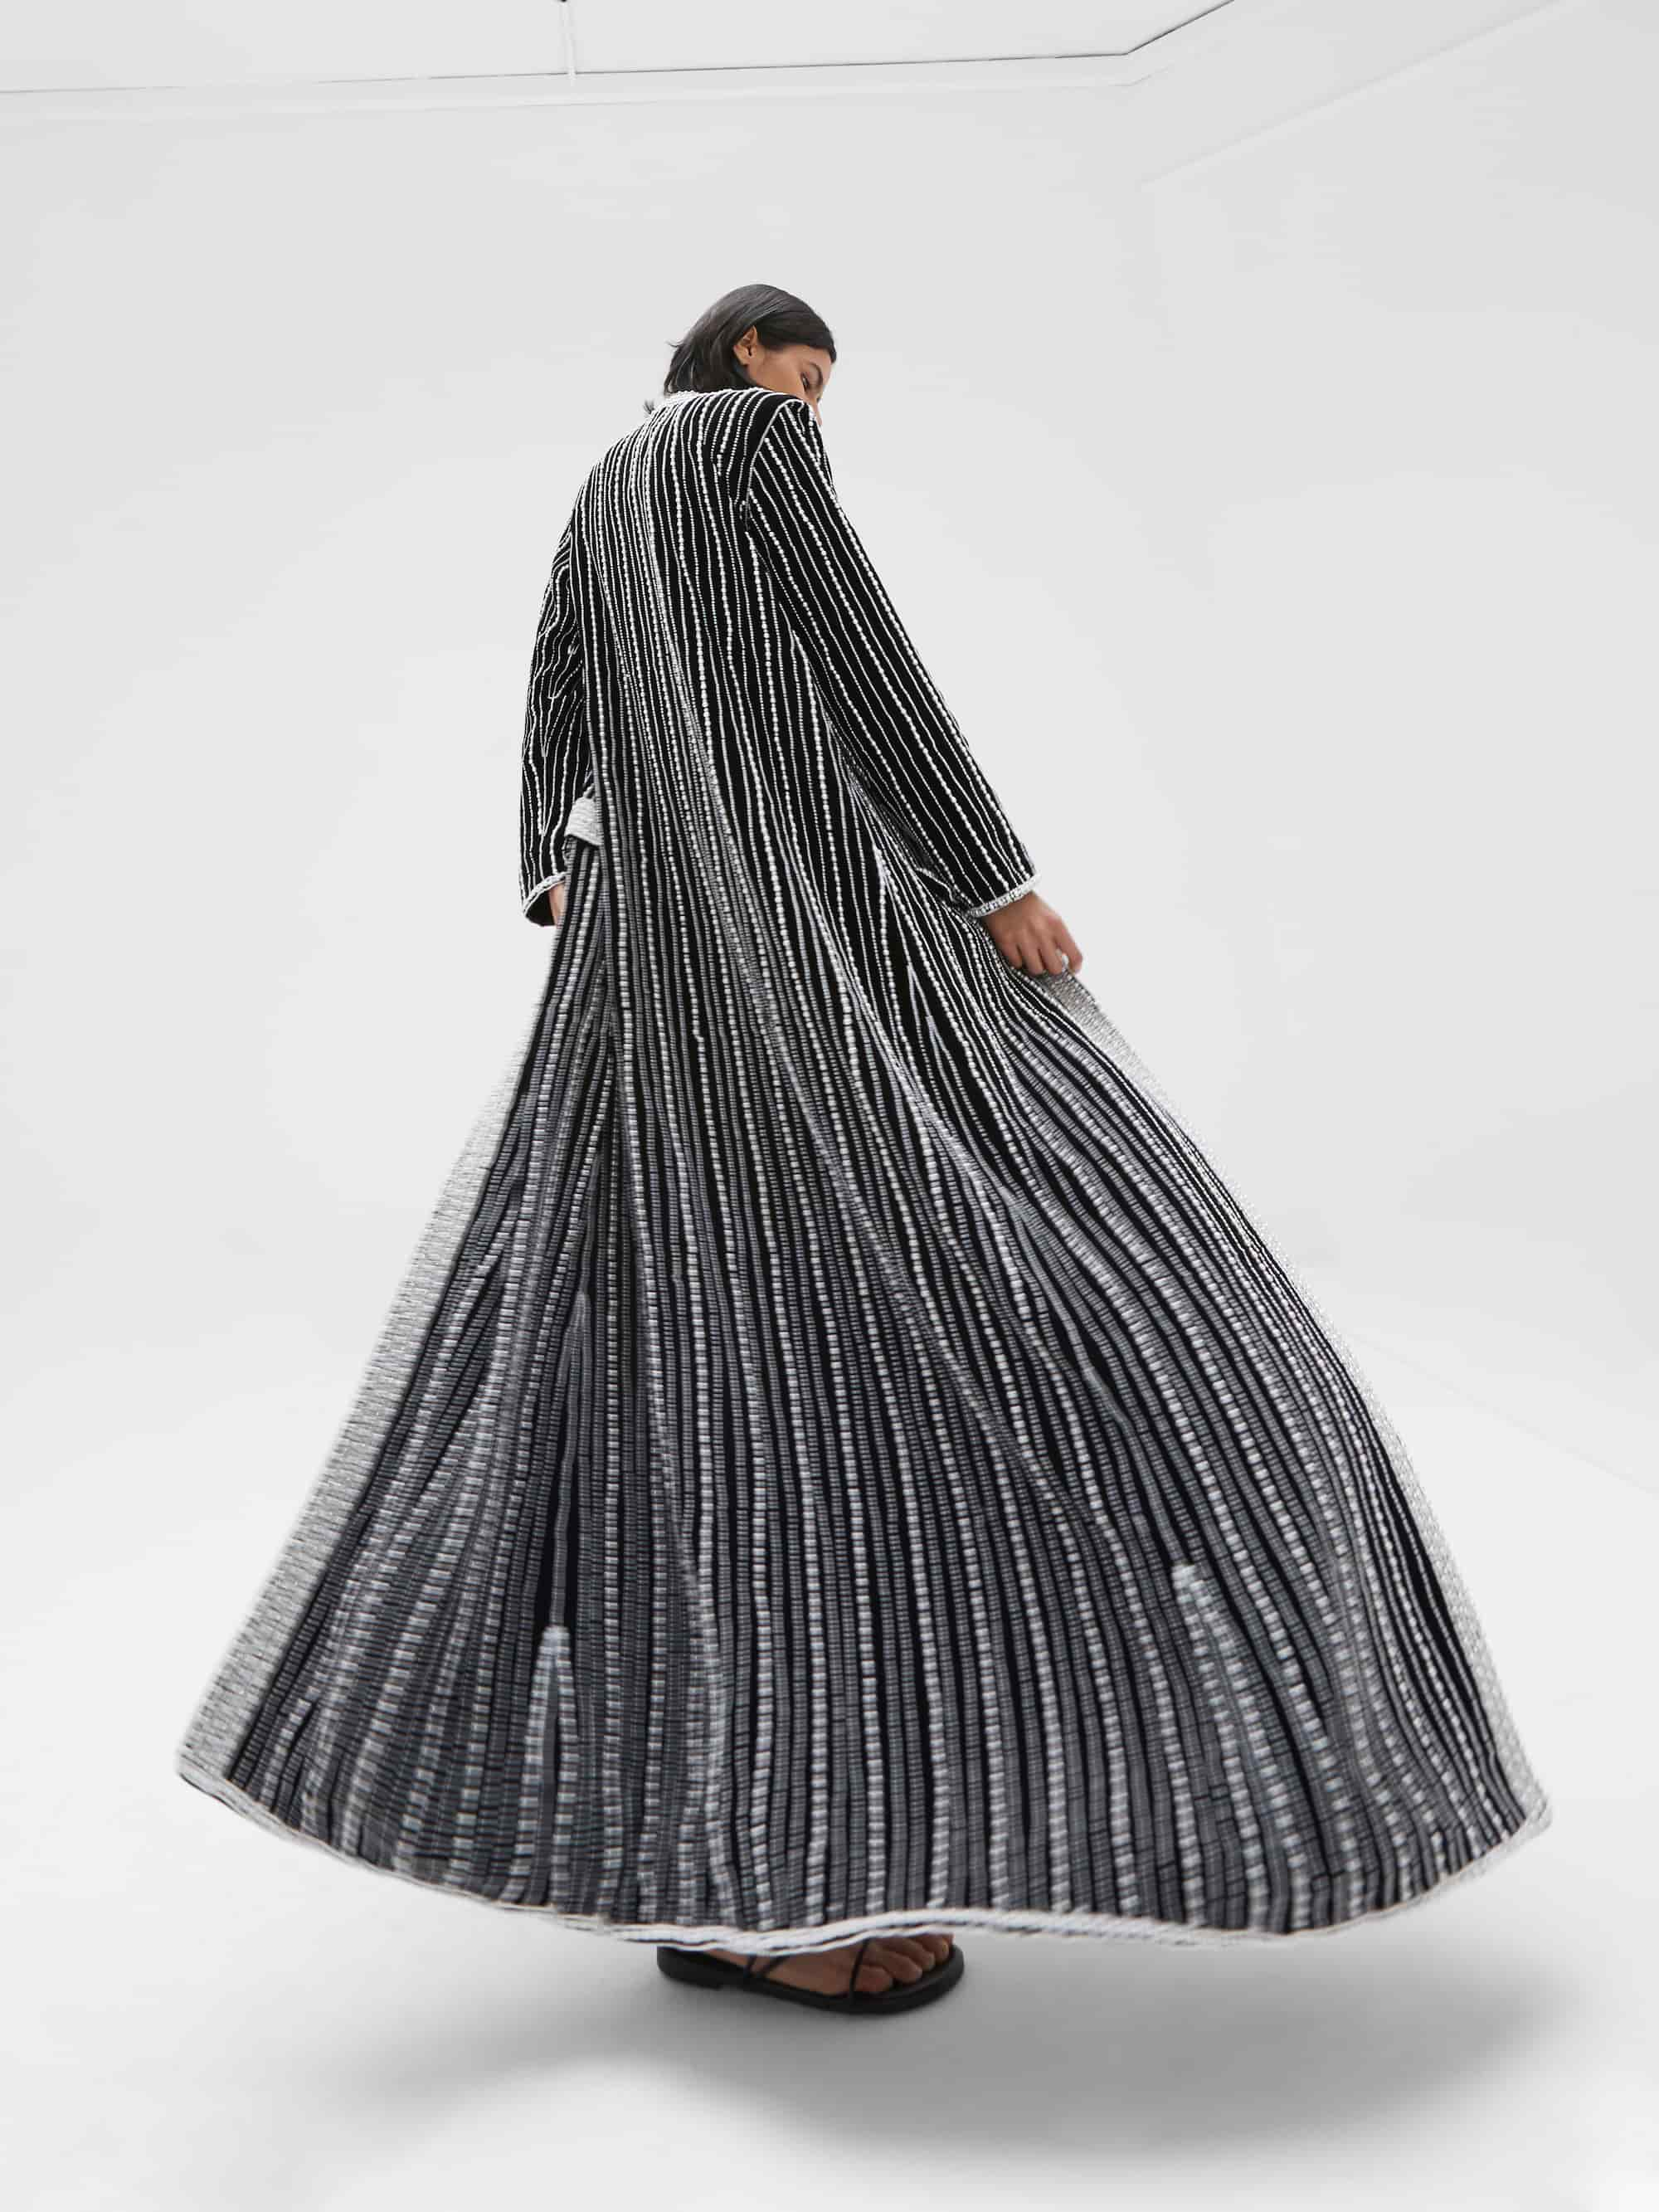 View 2 of model wearing Kasia Kimono in black.